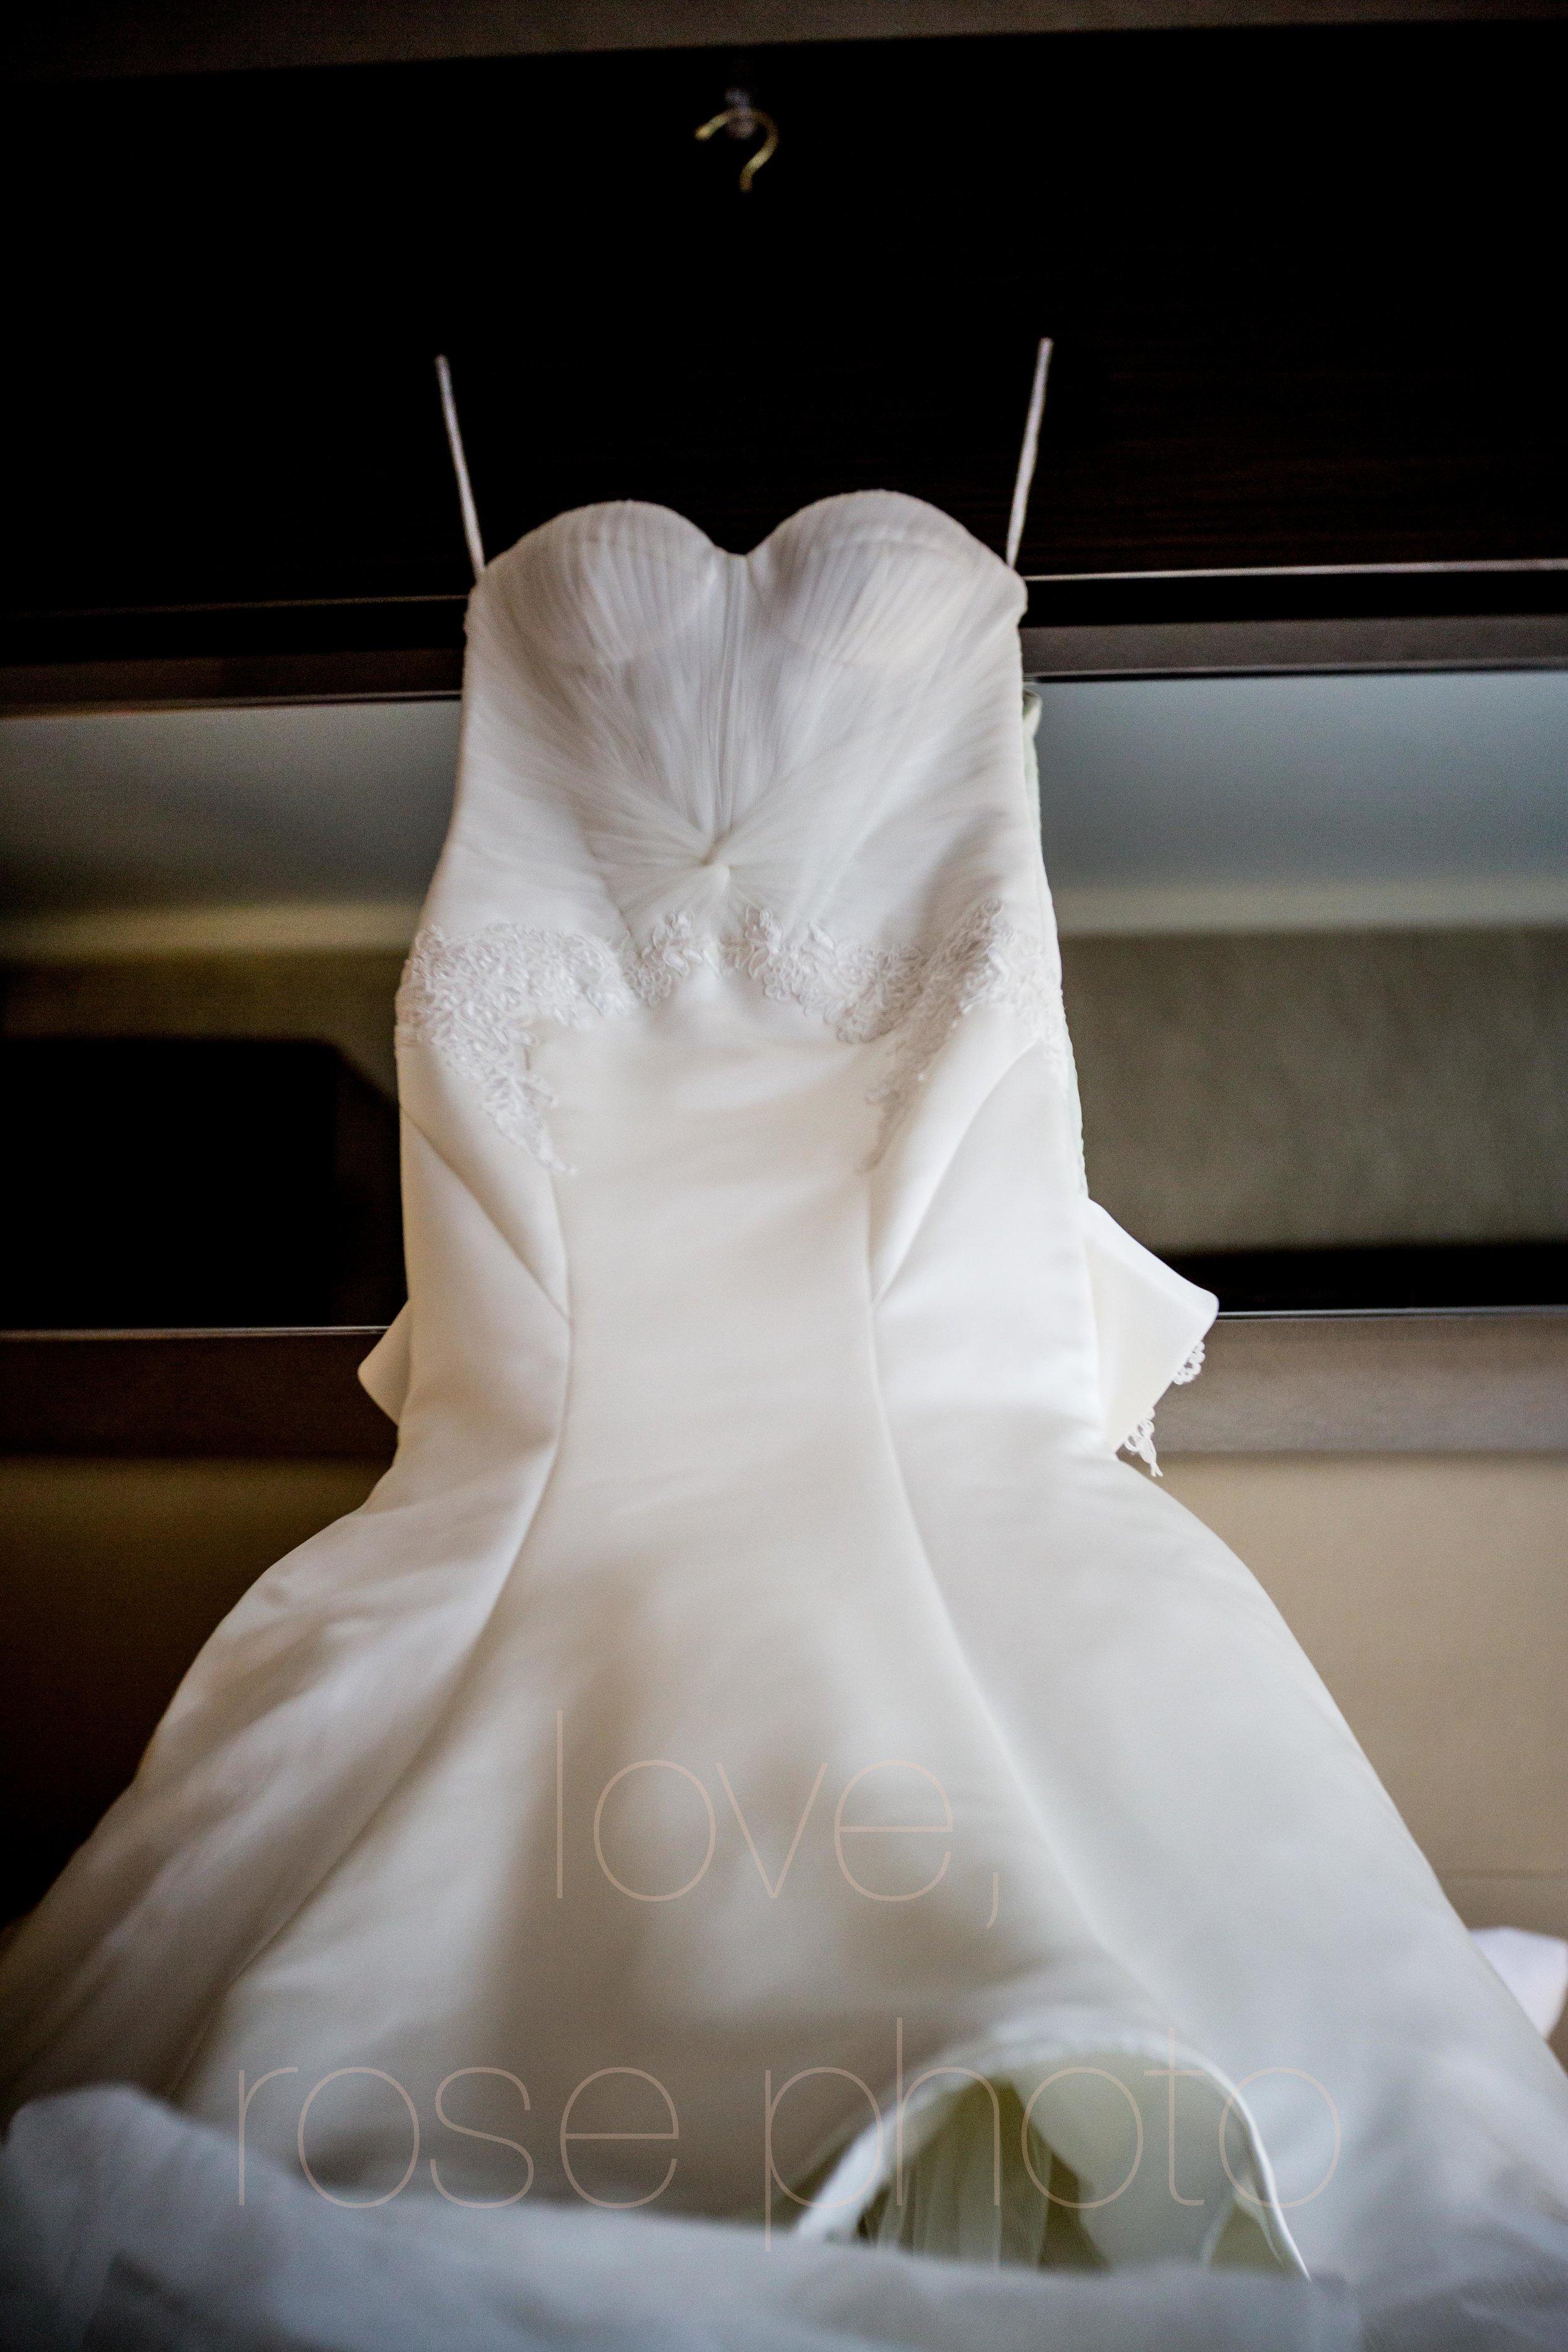 BRACEY rose photo chicago nyc wedding photographer asheville-2.jpg